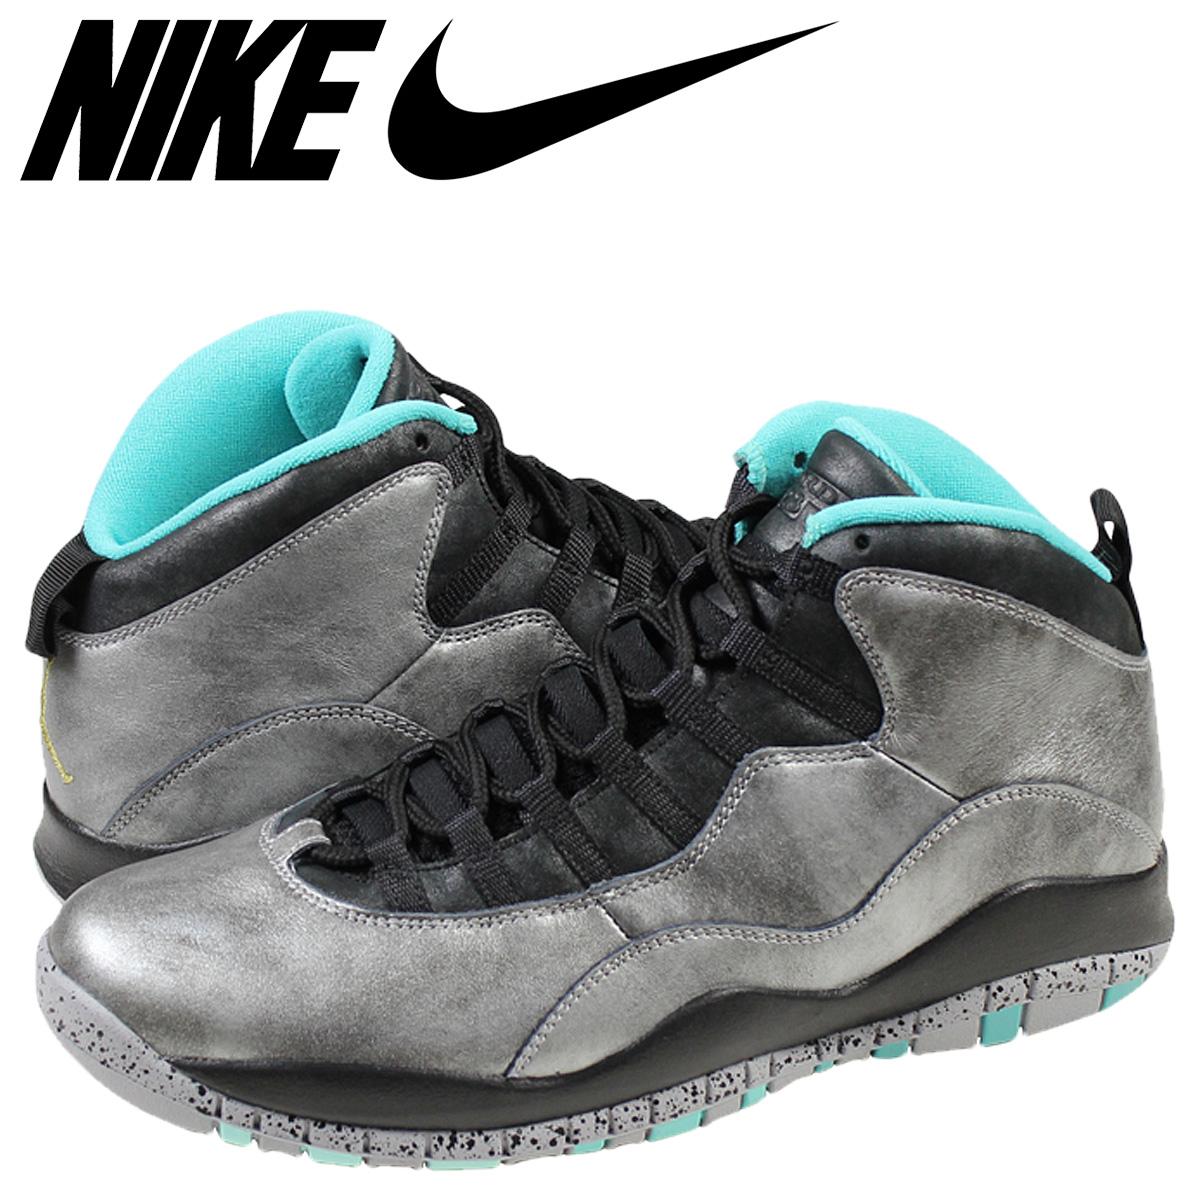 Nike Air Jordan 10 Retro X ASG Lady Liberty Cement Grey Black Teal 705178-045